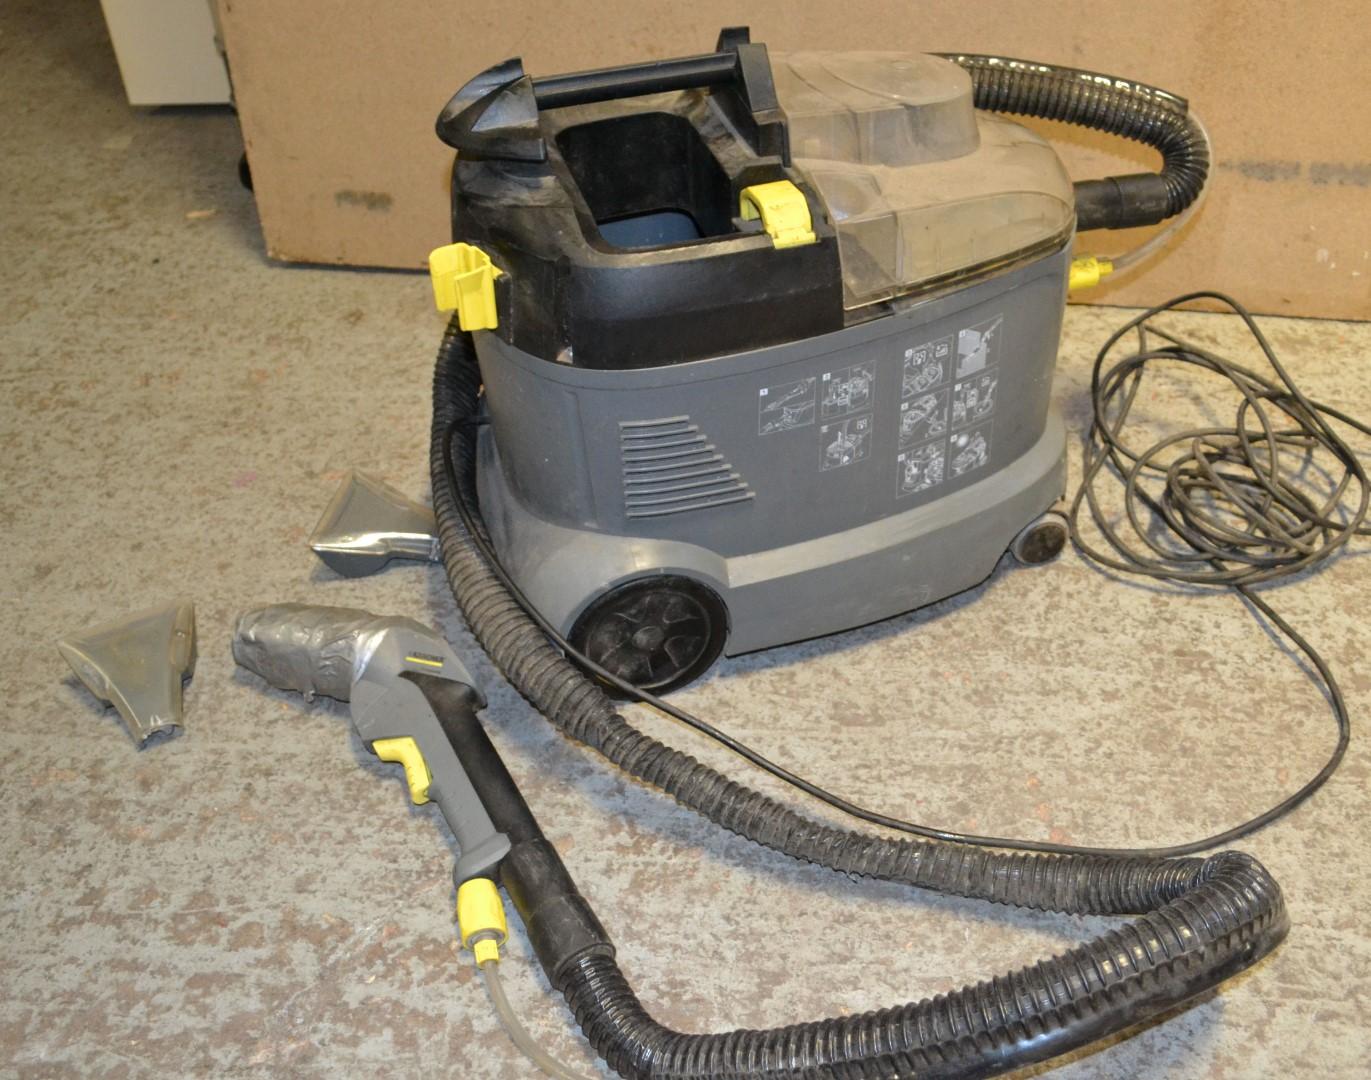 1 x karcher professional puzzi 8 1c spray extraction. Black Bedroom Furniture Sets. Home Design Ideas